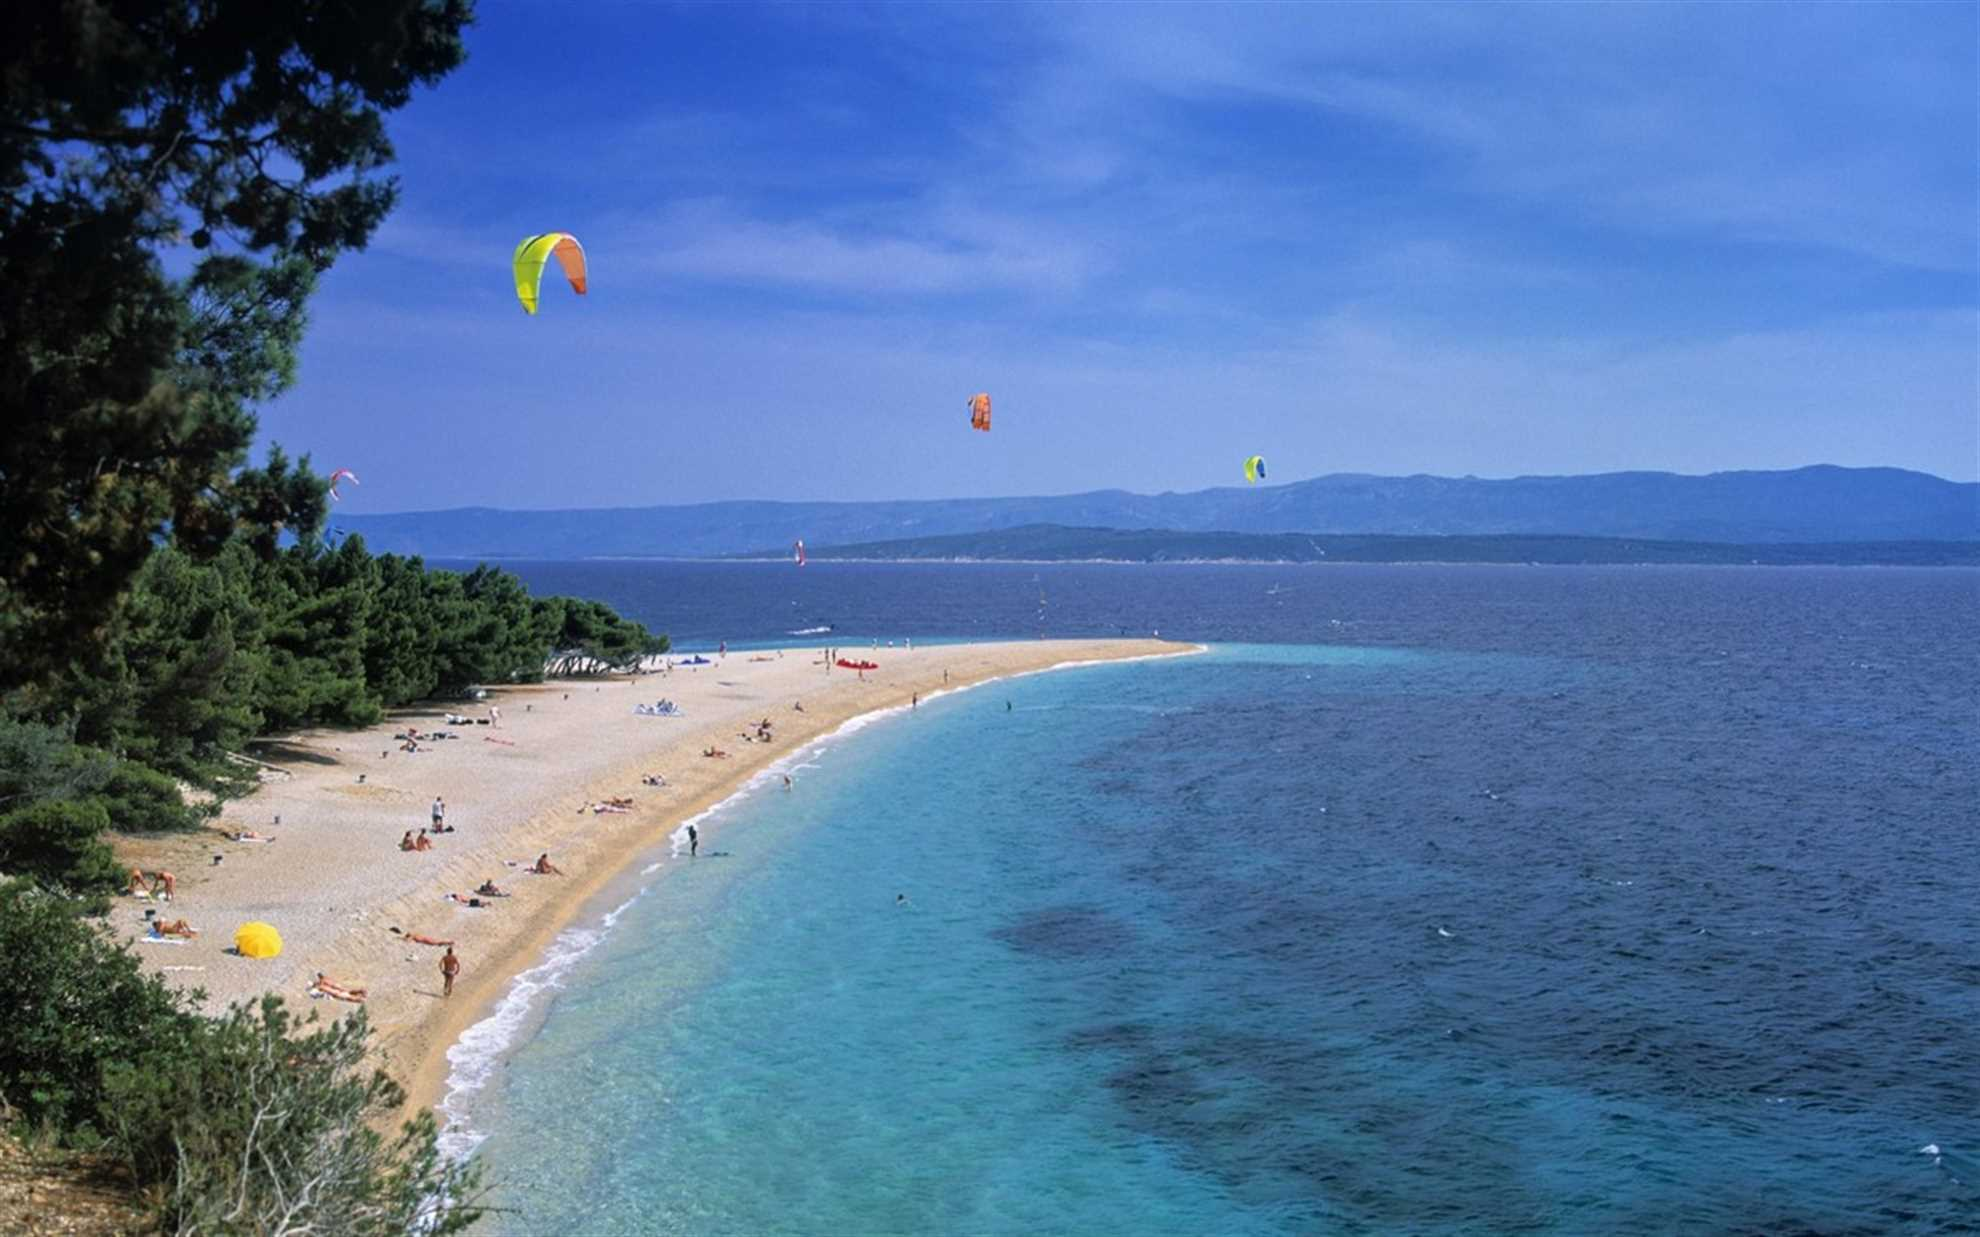 Golden Horn Beach is popular for windsurfing